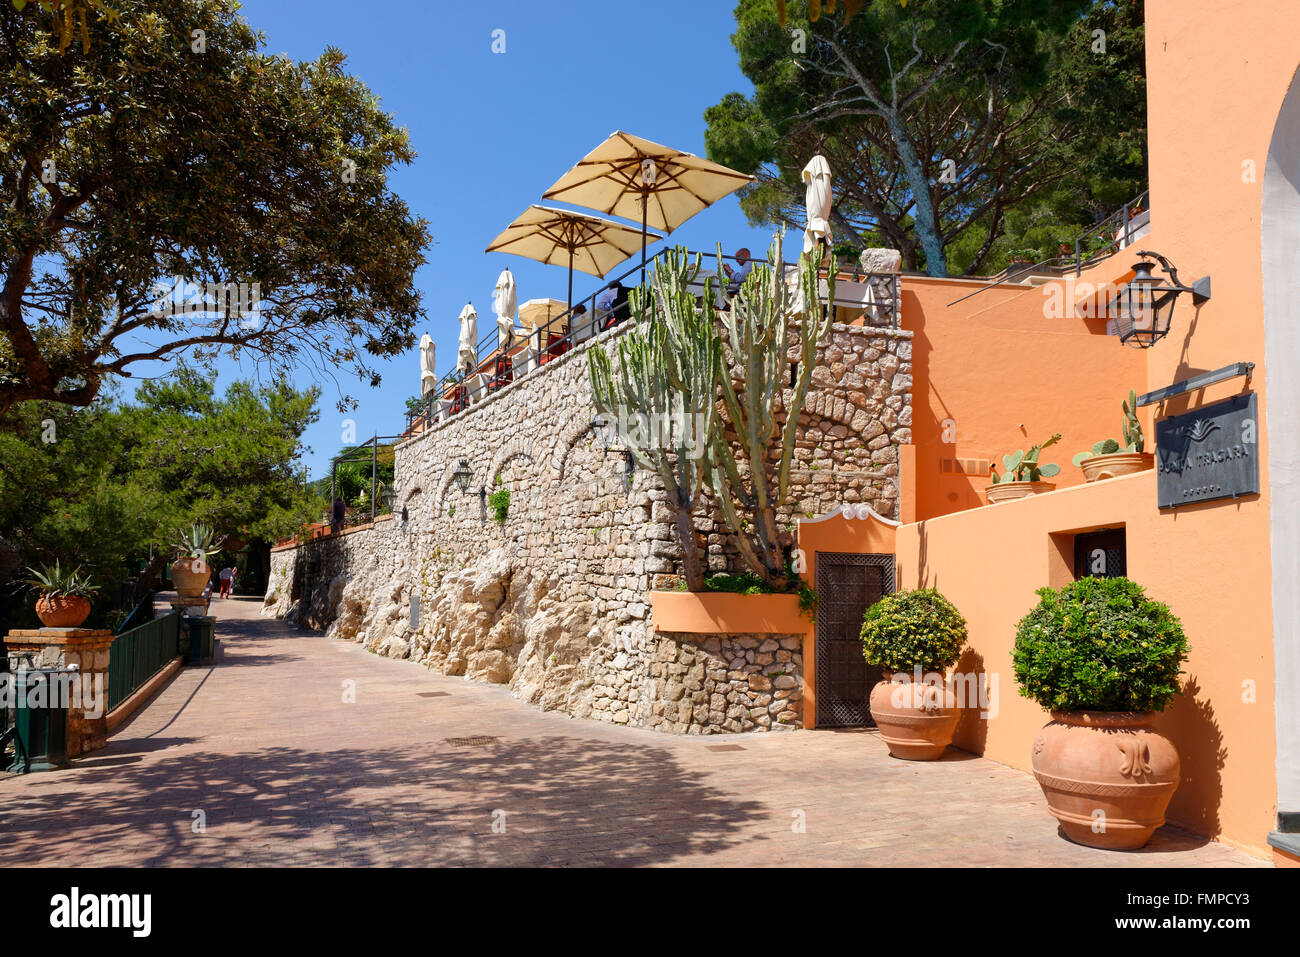 hotel punta tragara architect le corbusier island of capri capri gulf of naples campania italy